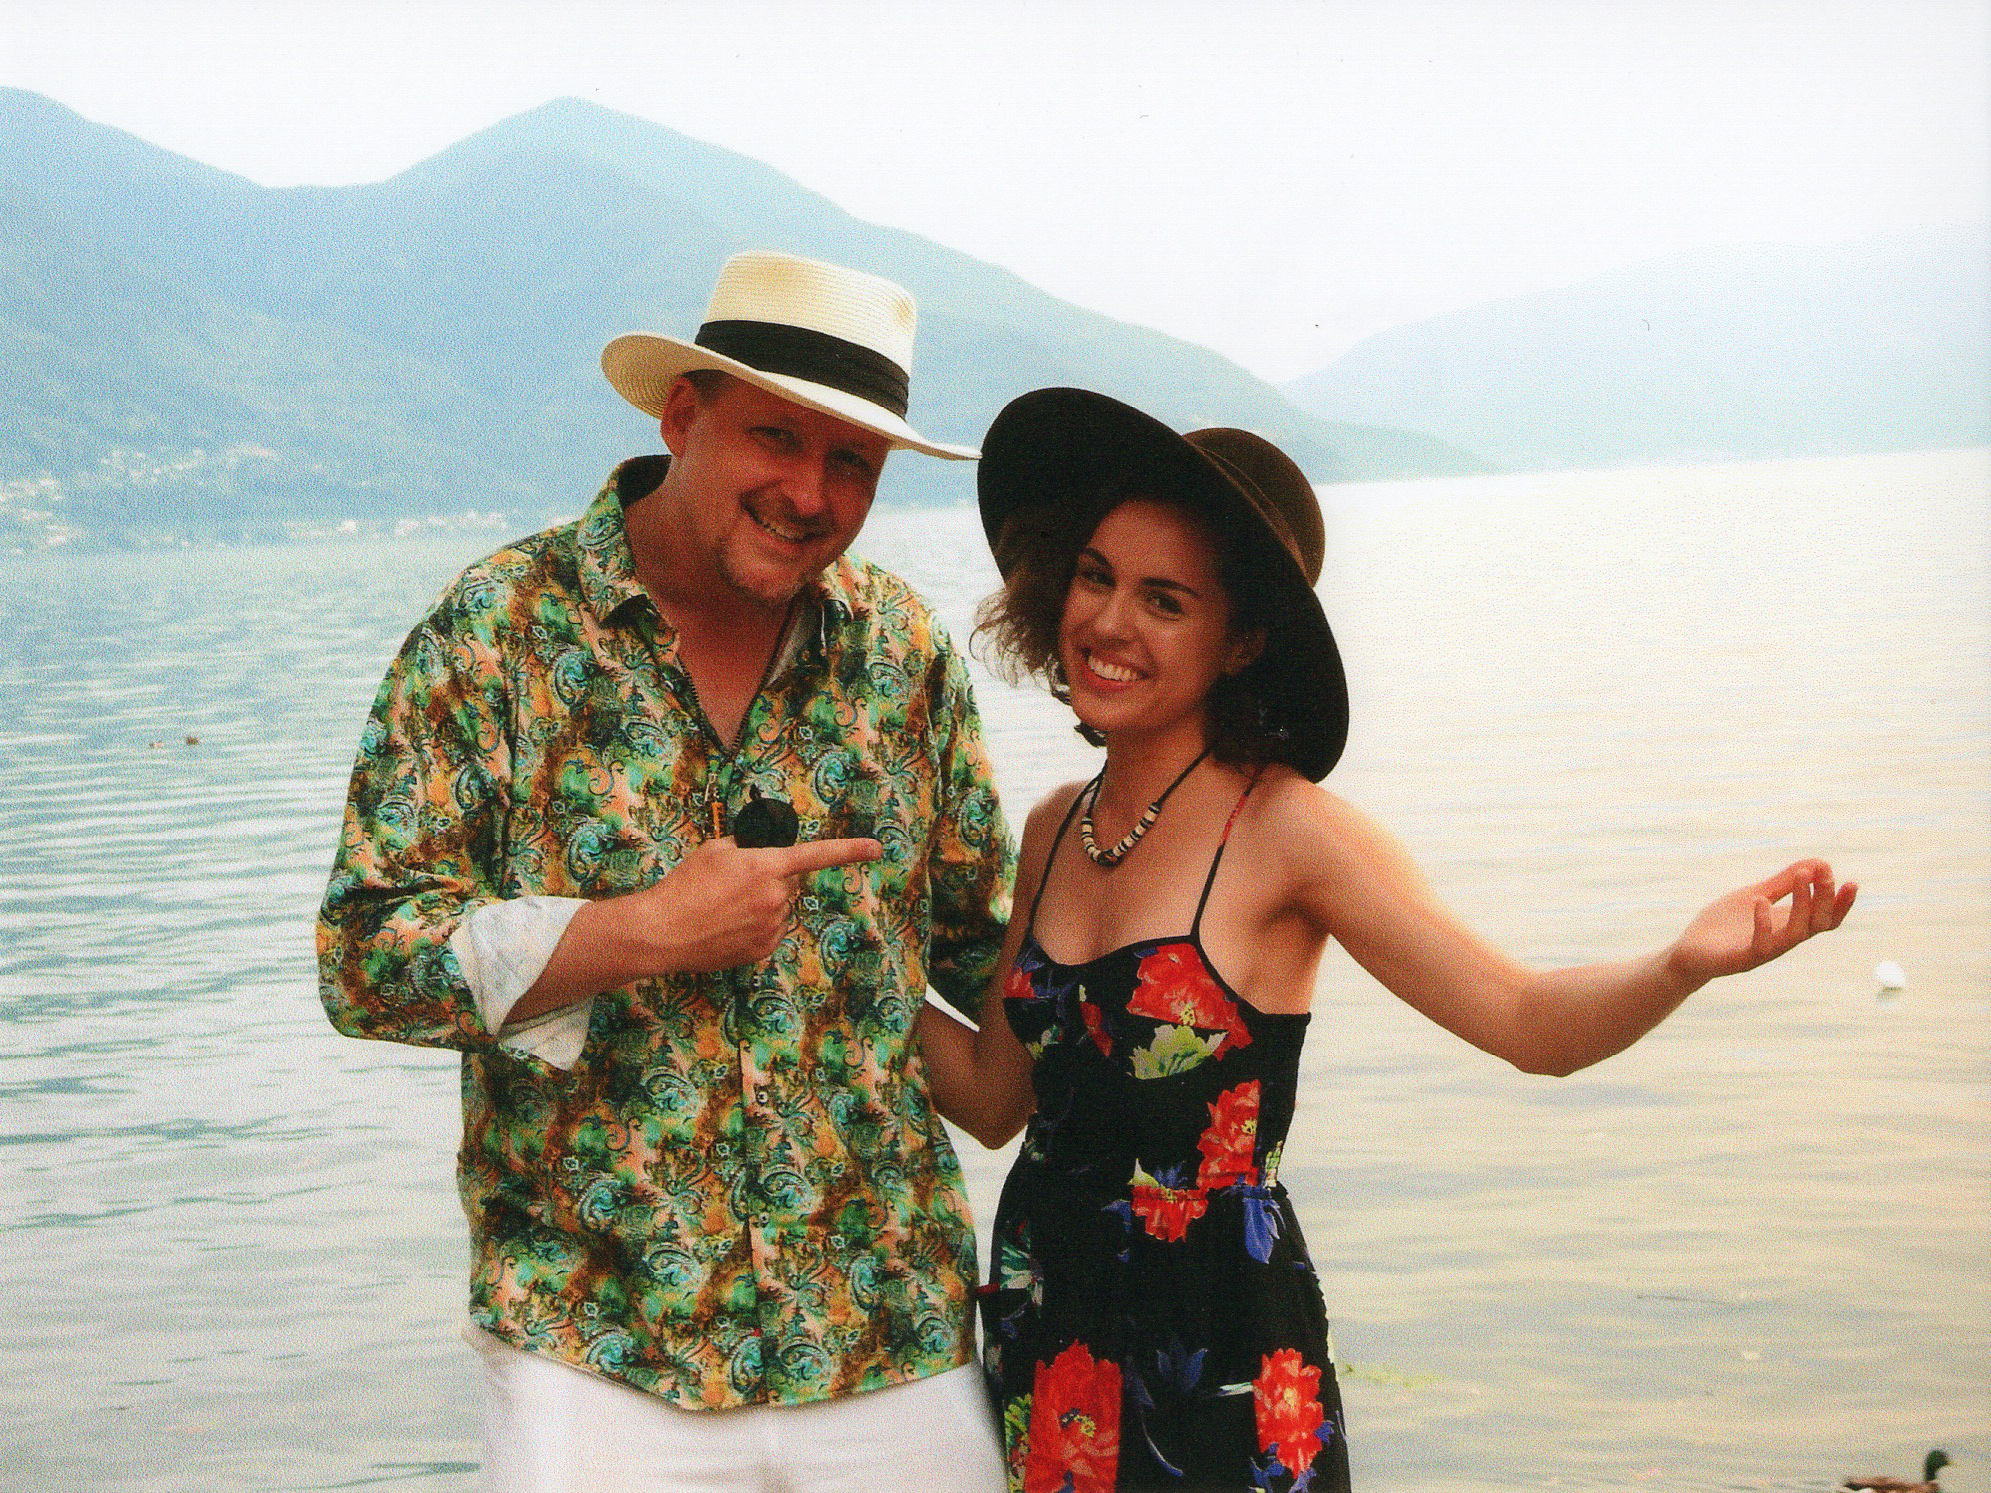 Onlinekonzert mit Cleo - Erinnerungen an Ascona Jazz Festival 2018